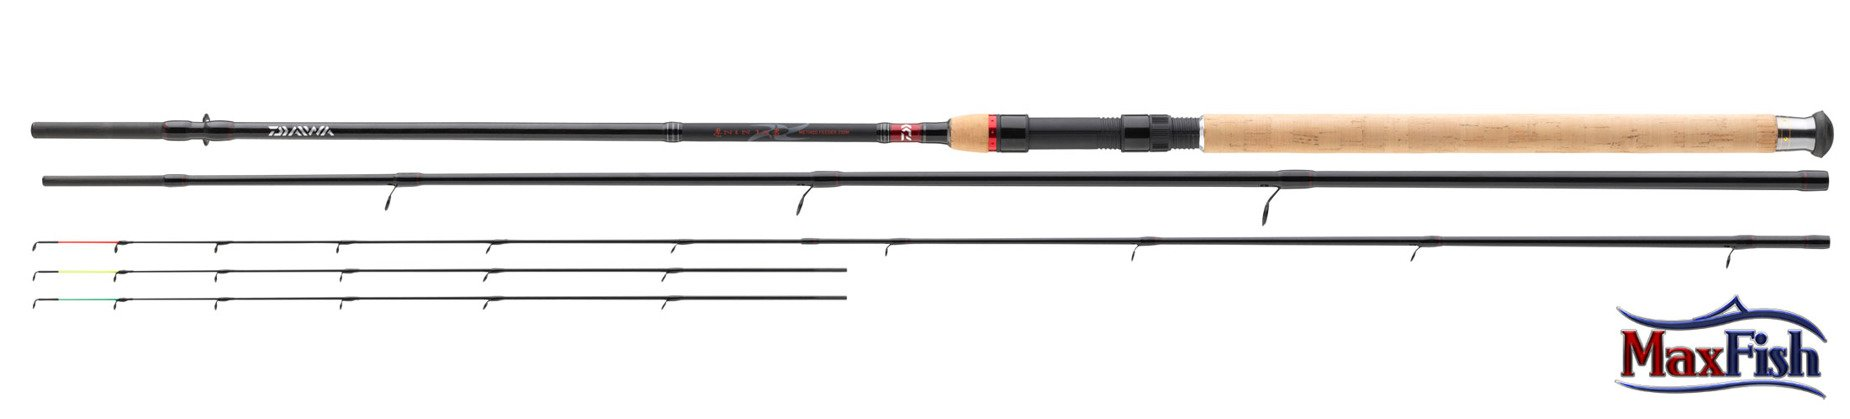 Daiwa Ninja X Method Feeder  360cm -80g